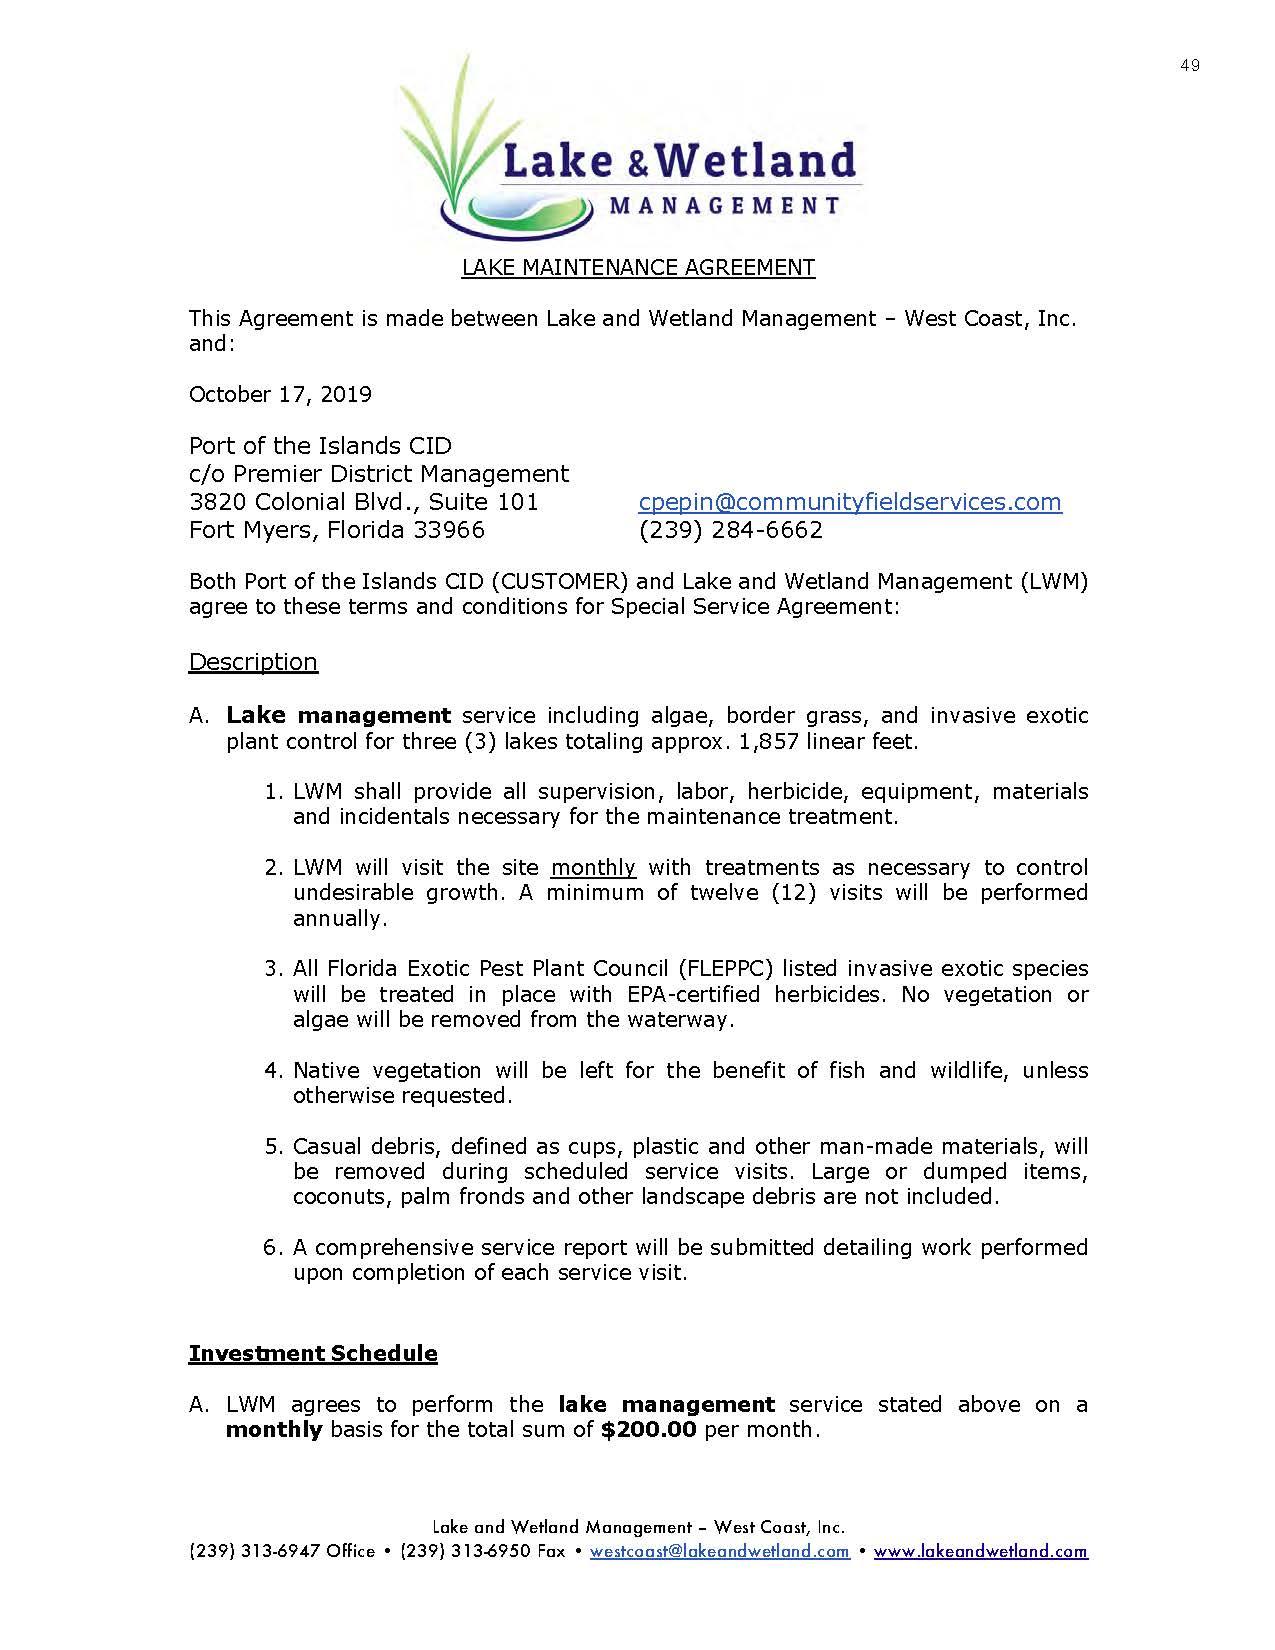 Lake & Wetlands Management Lake Maintenance Agreement